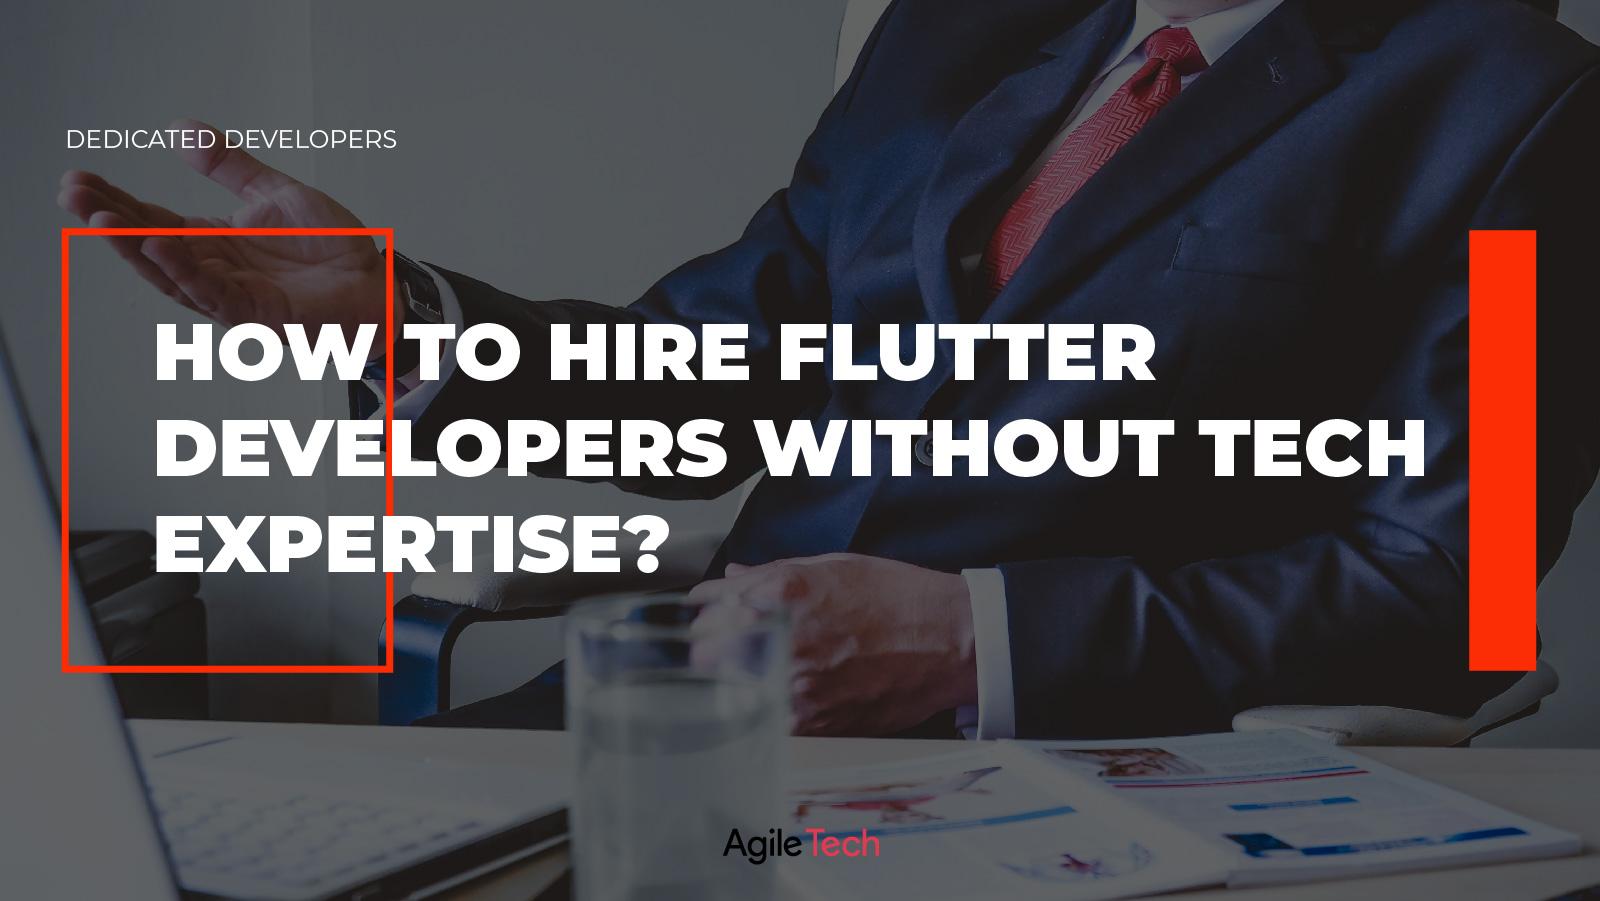 flutter developers, hiring flutter app devleopers, how to hire flutter developers without tech expertise, agiletech